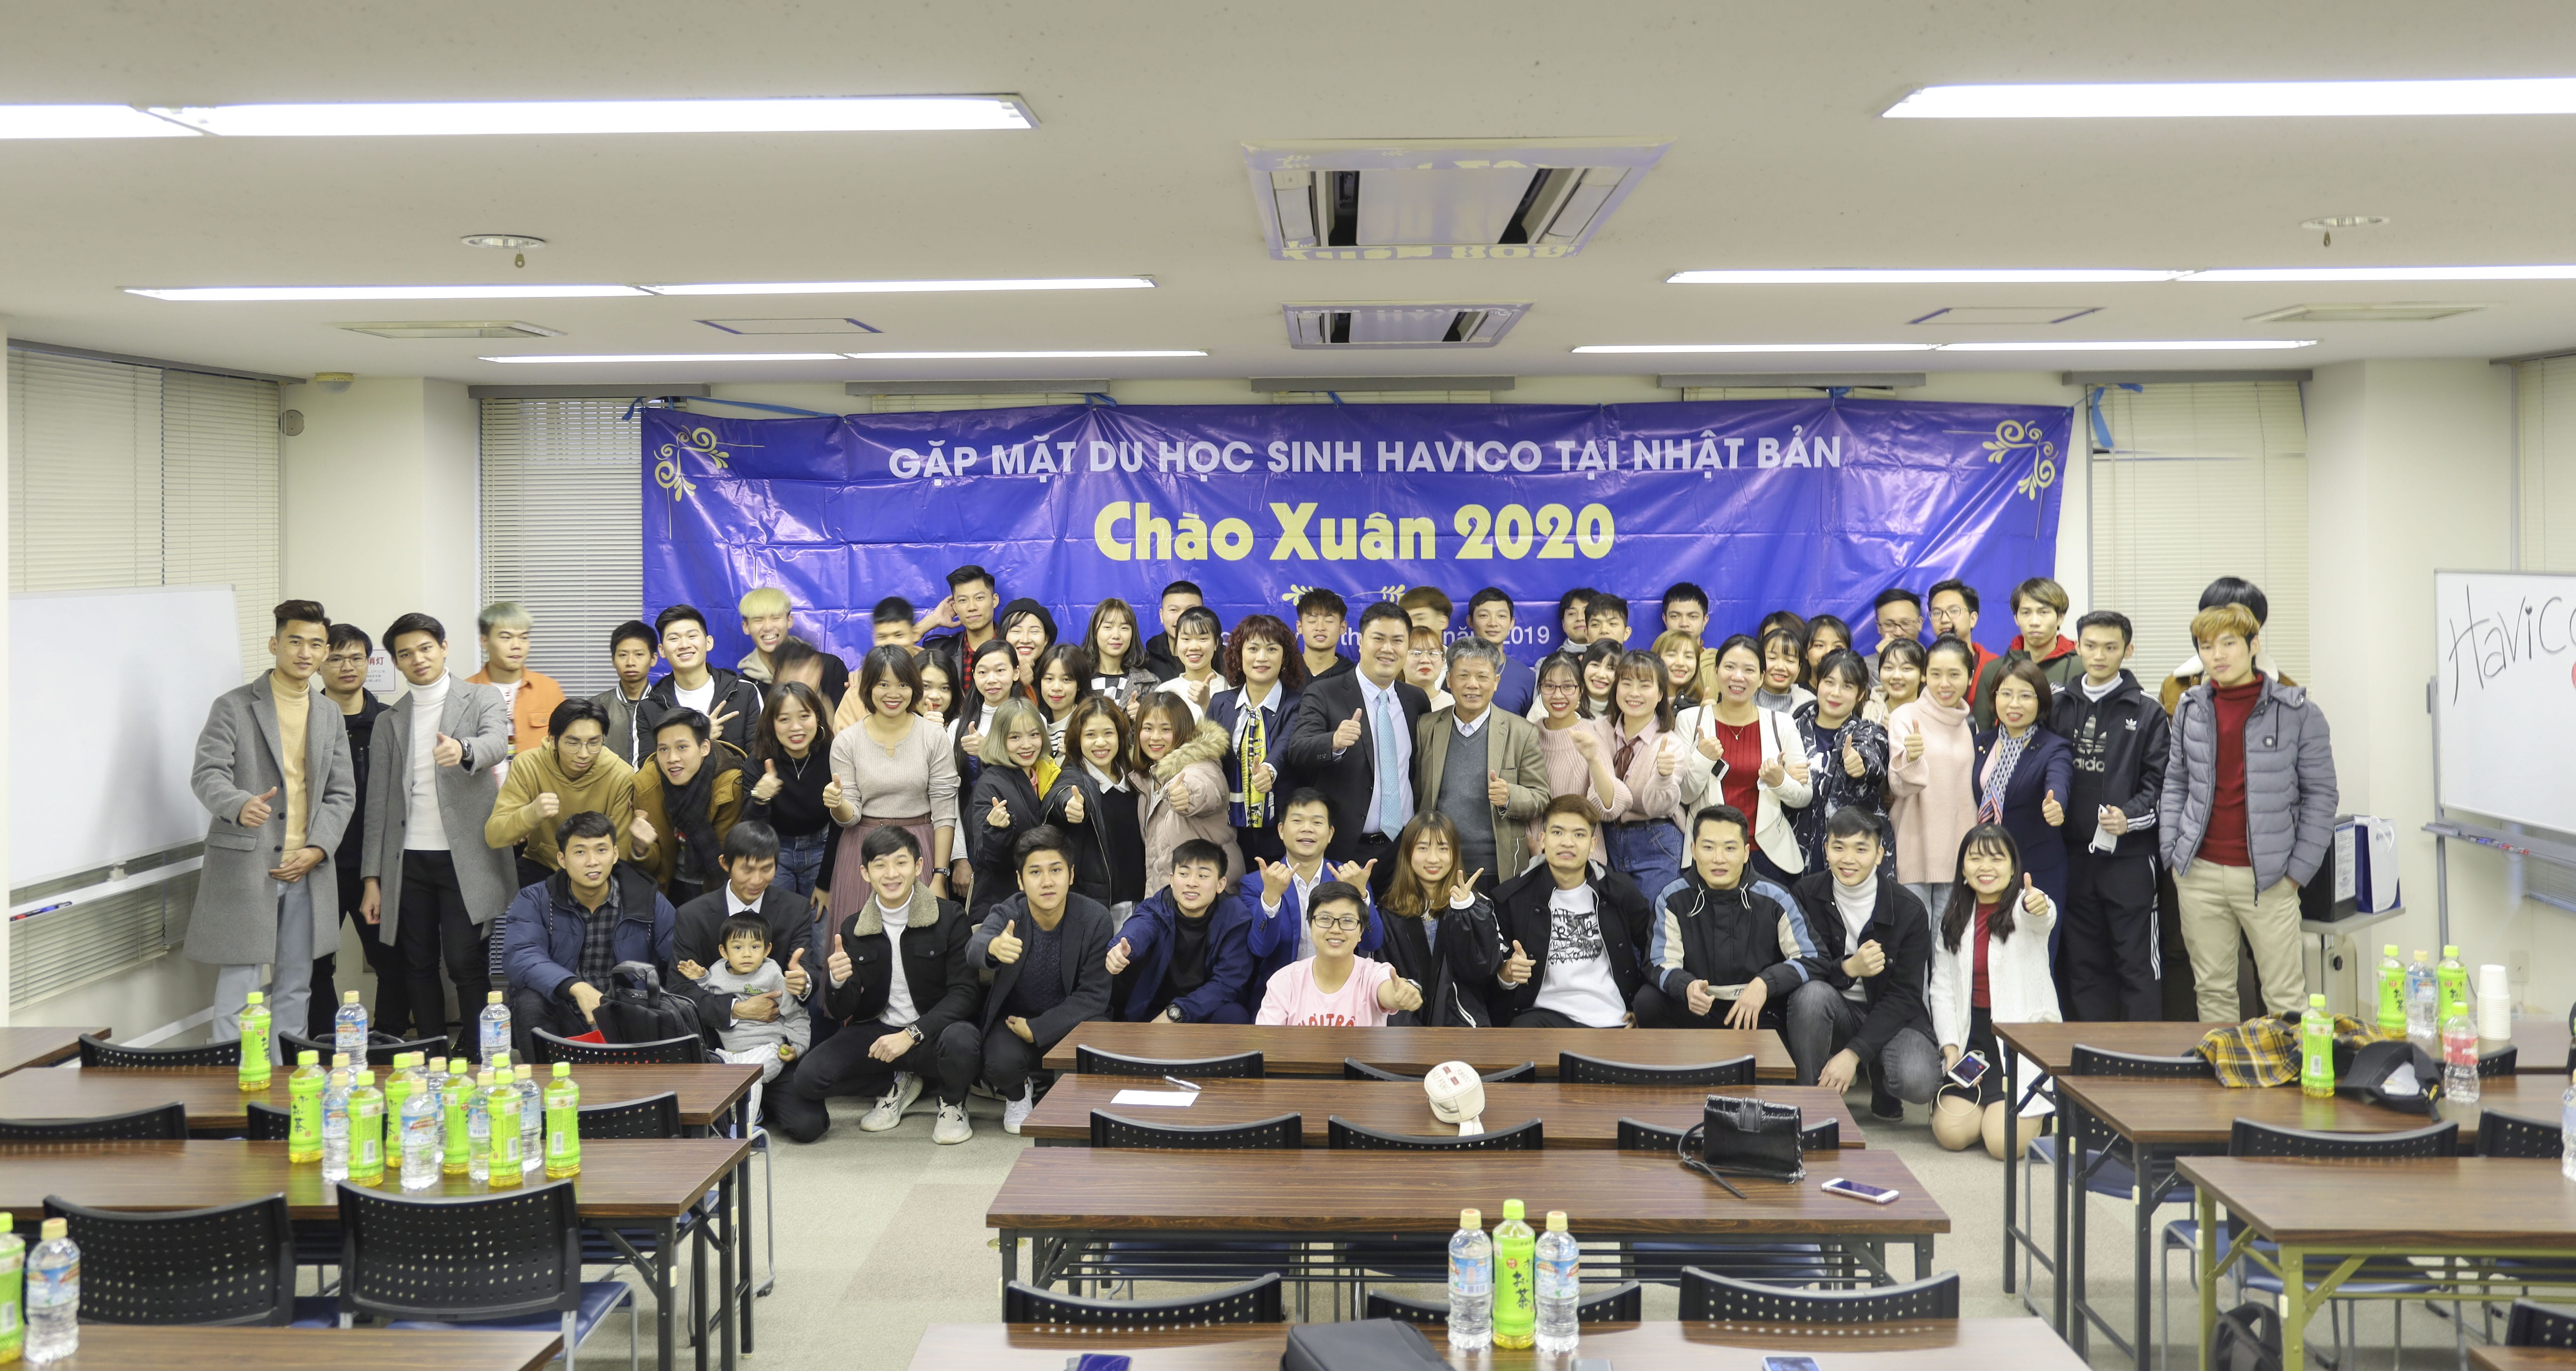 Gặp mặt du học sinh HAVICO tại Nhật Bản